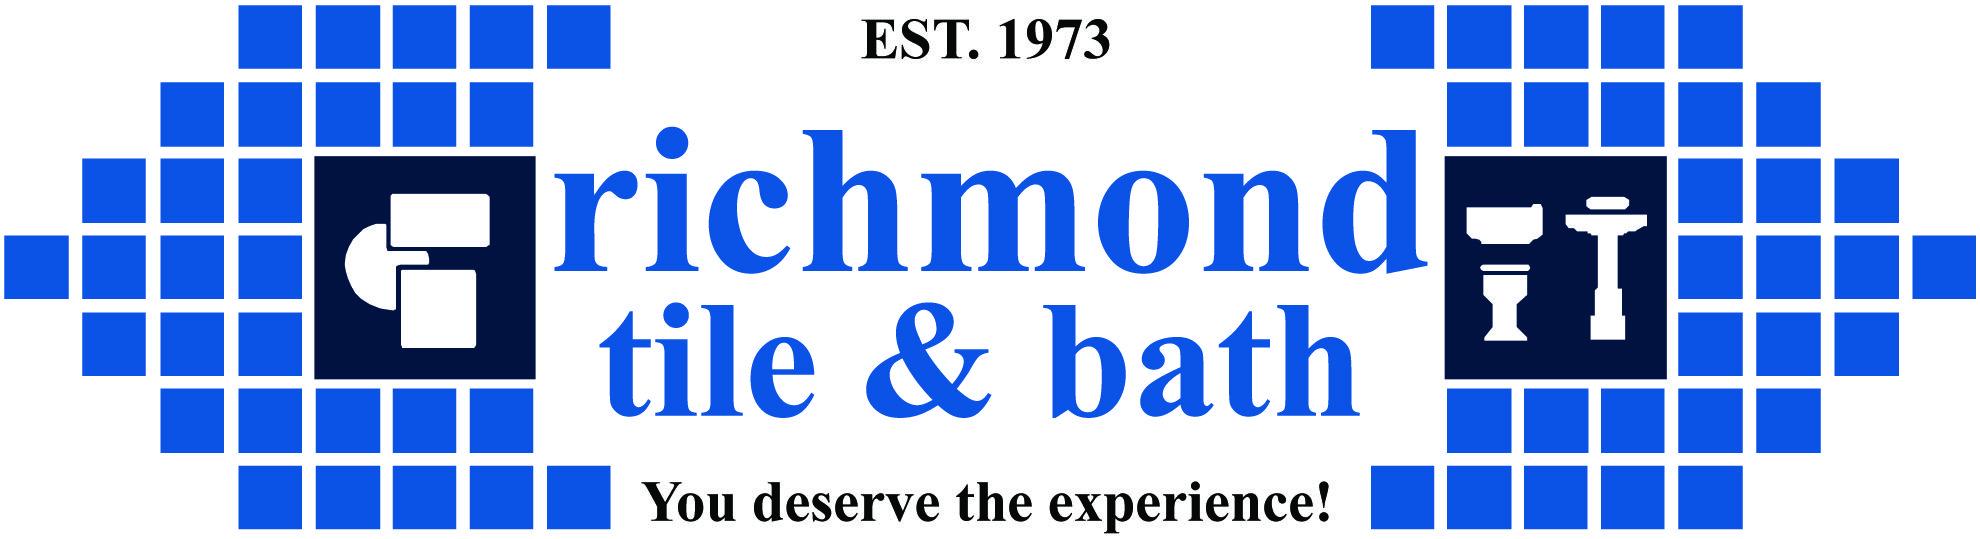 Richmond ceramic tile bathroom tile designs pinterest tile richmond ceramic tile dailygadgetfo Gallery